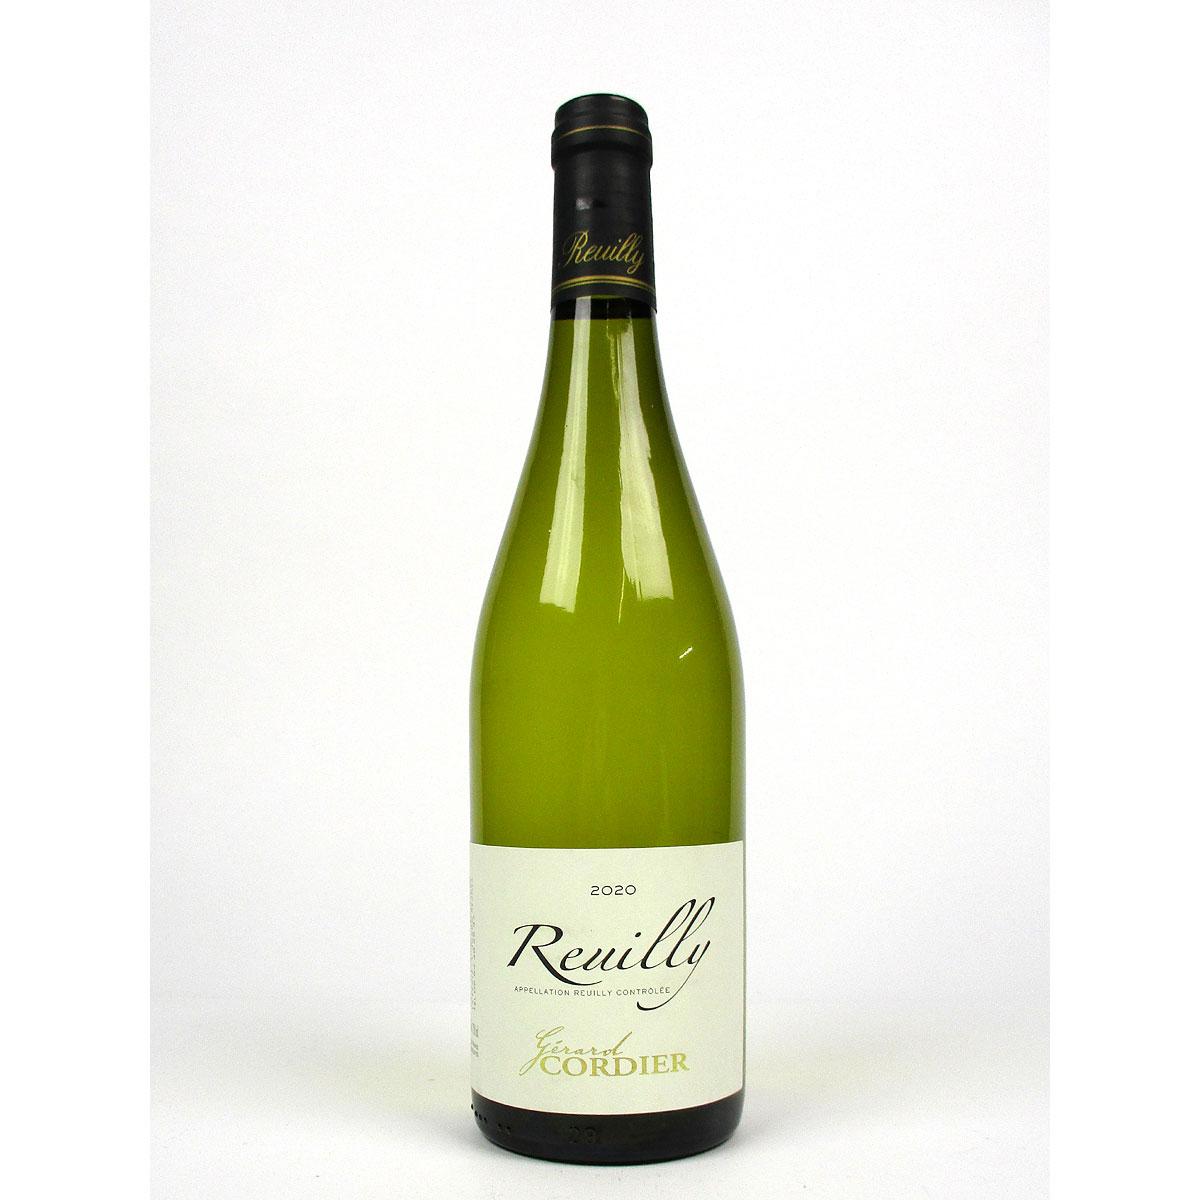 Reuilly: Gerard Cordier Blanc 2020 - Bottle